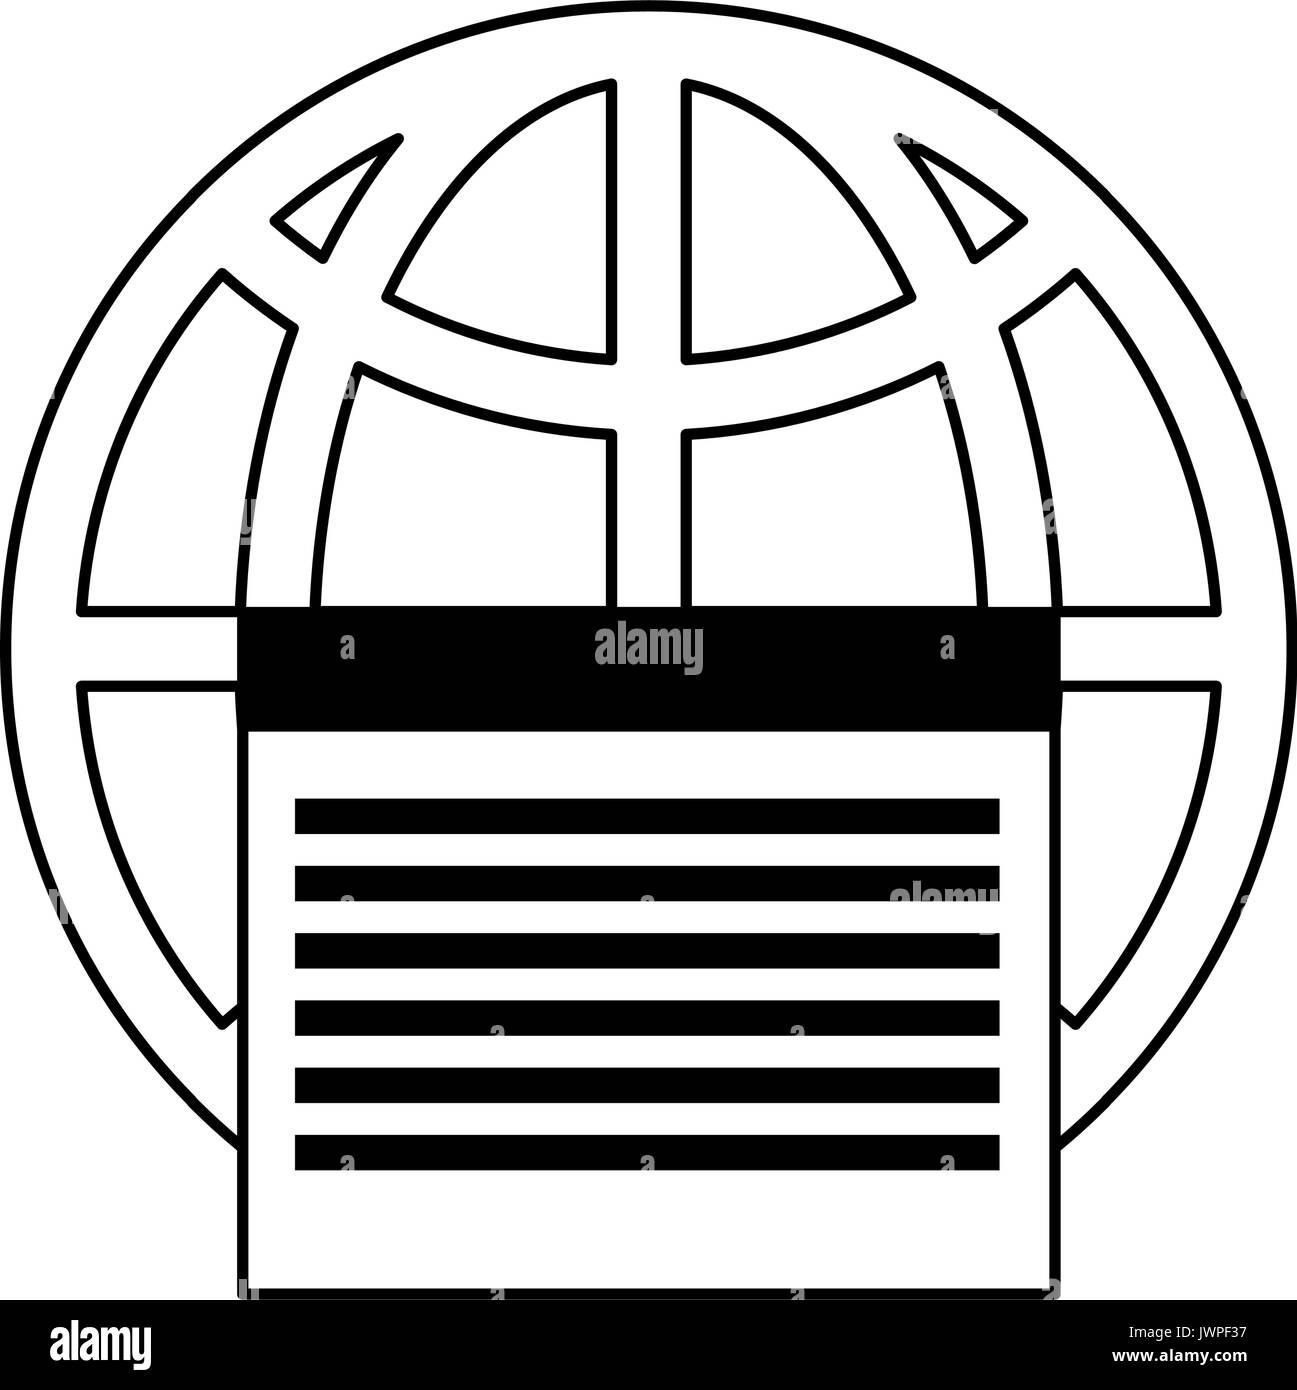 hight resolution of earth globe diagram communication icon image